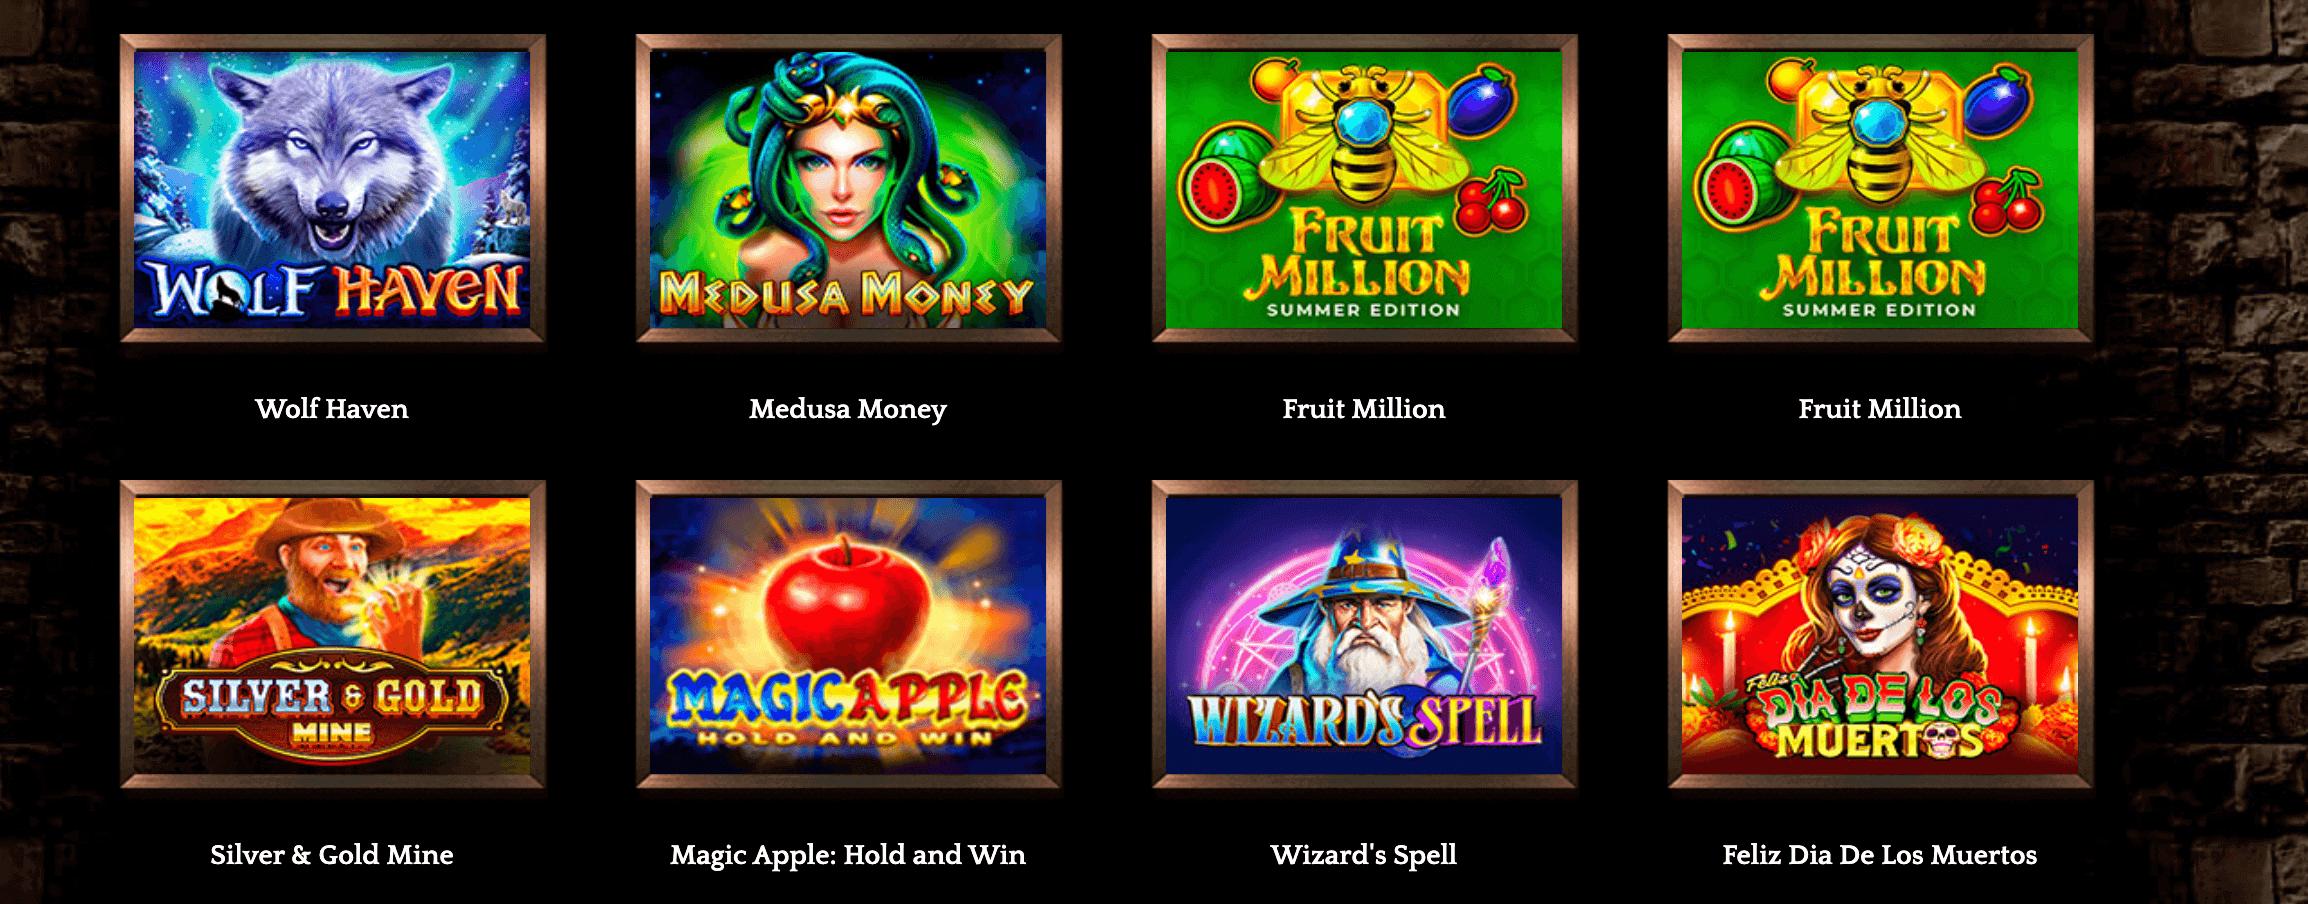 Golden Axe Casino Slot